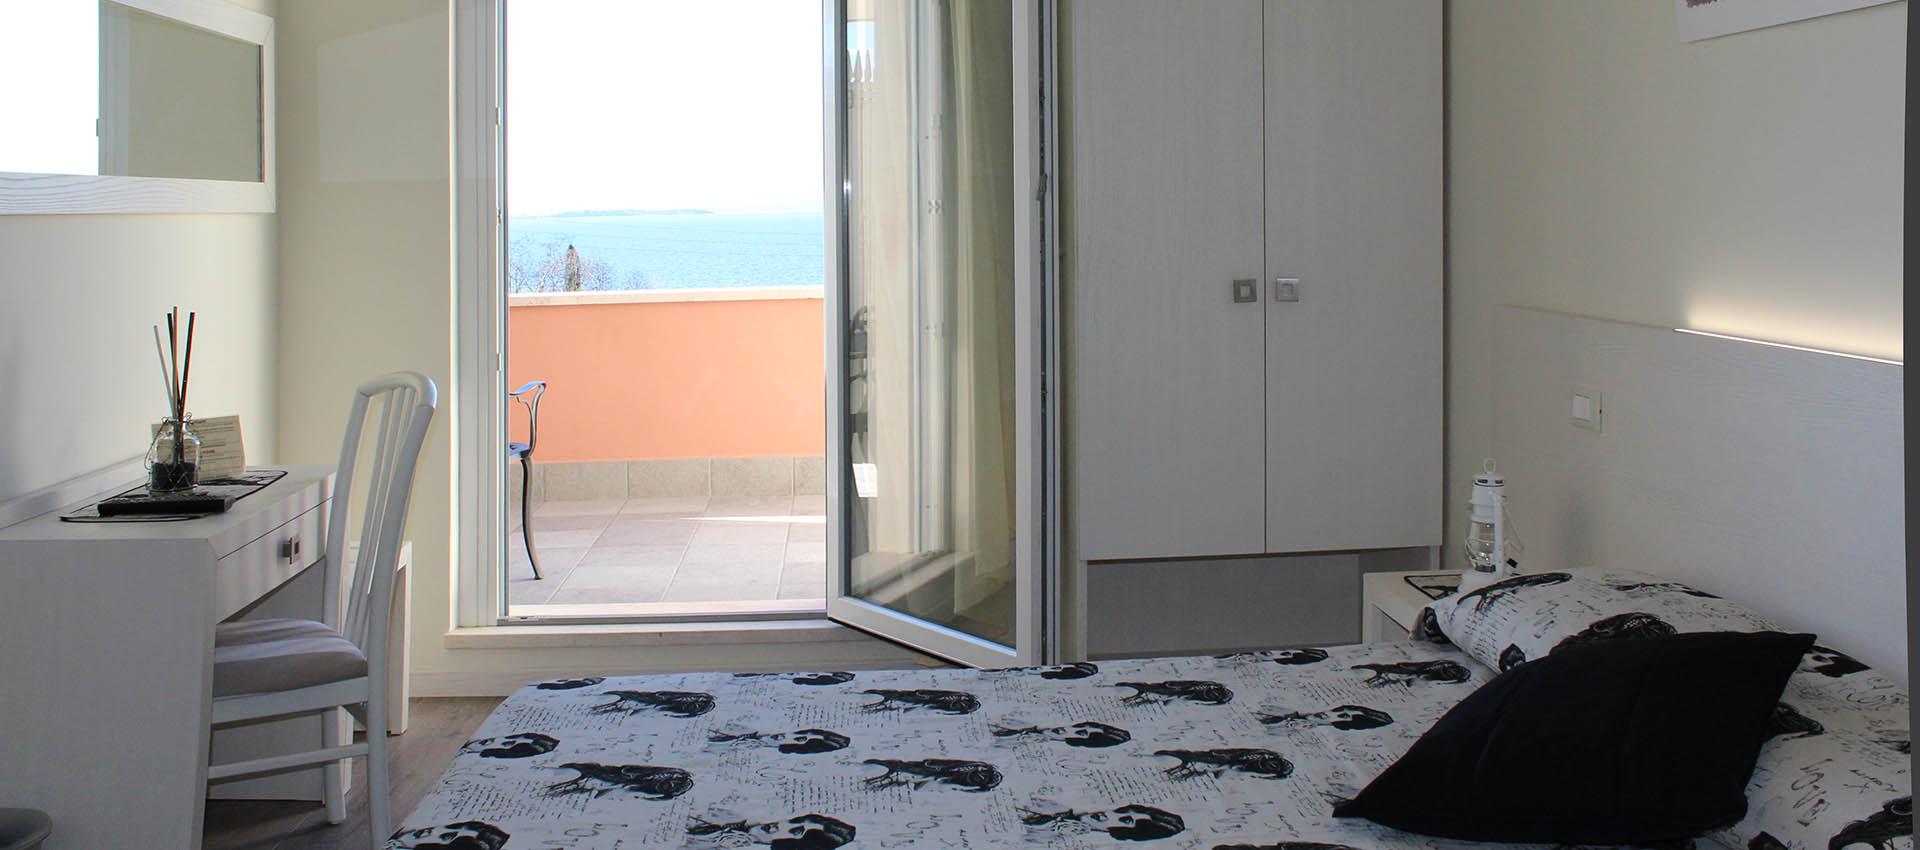 Rooms Hotel Cristina - Lazise